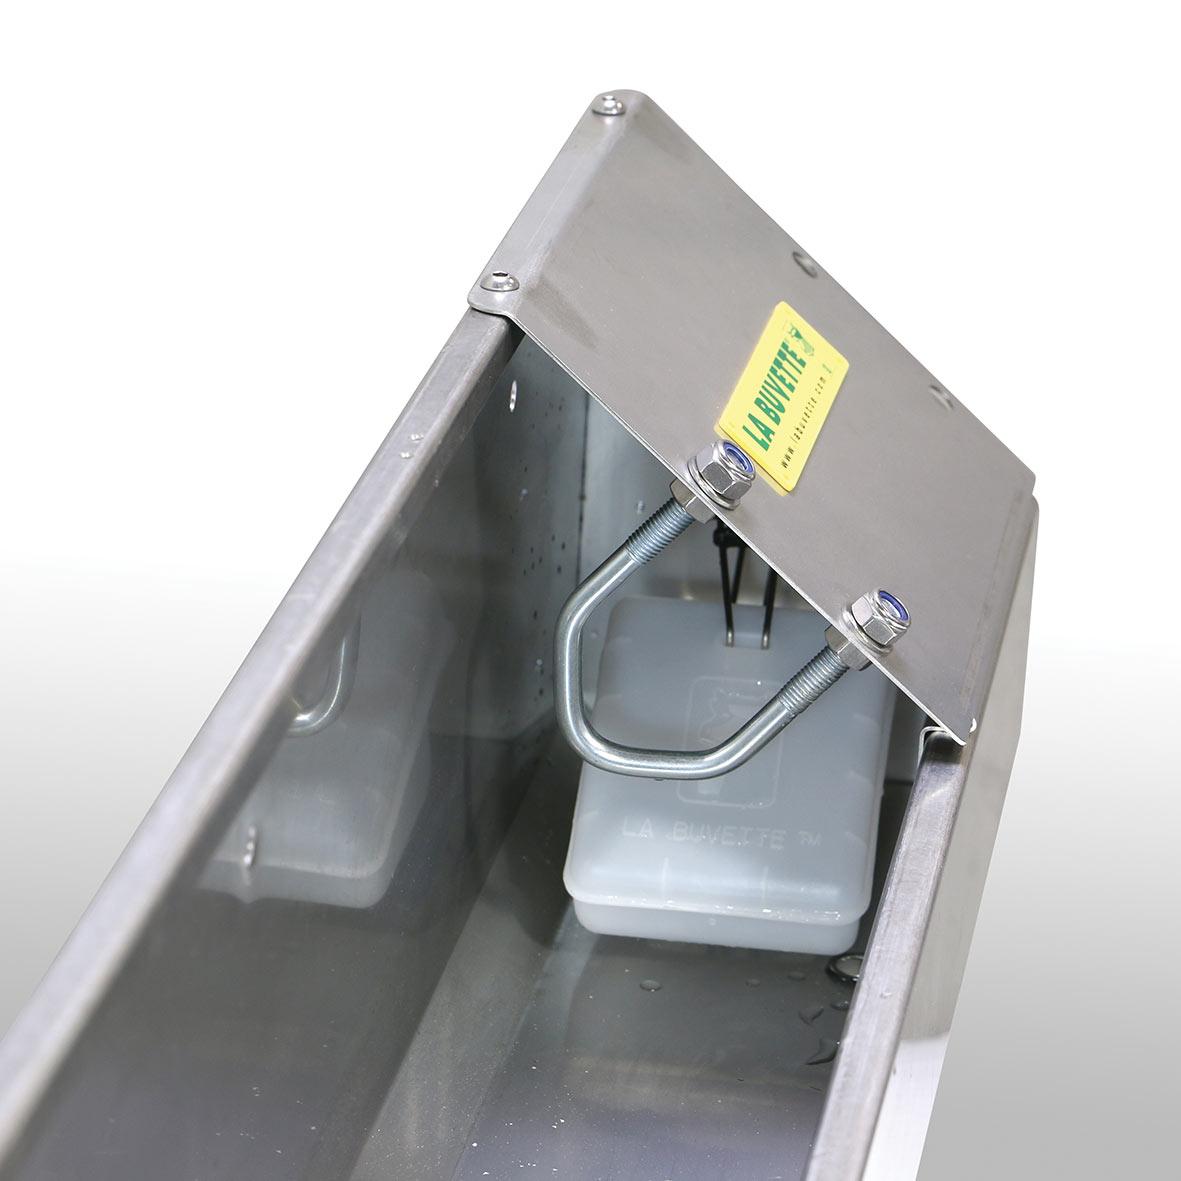 OVICAP INOX 240 bebedero de acero inoxidable